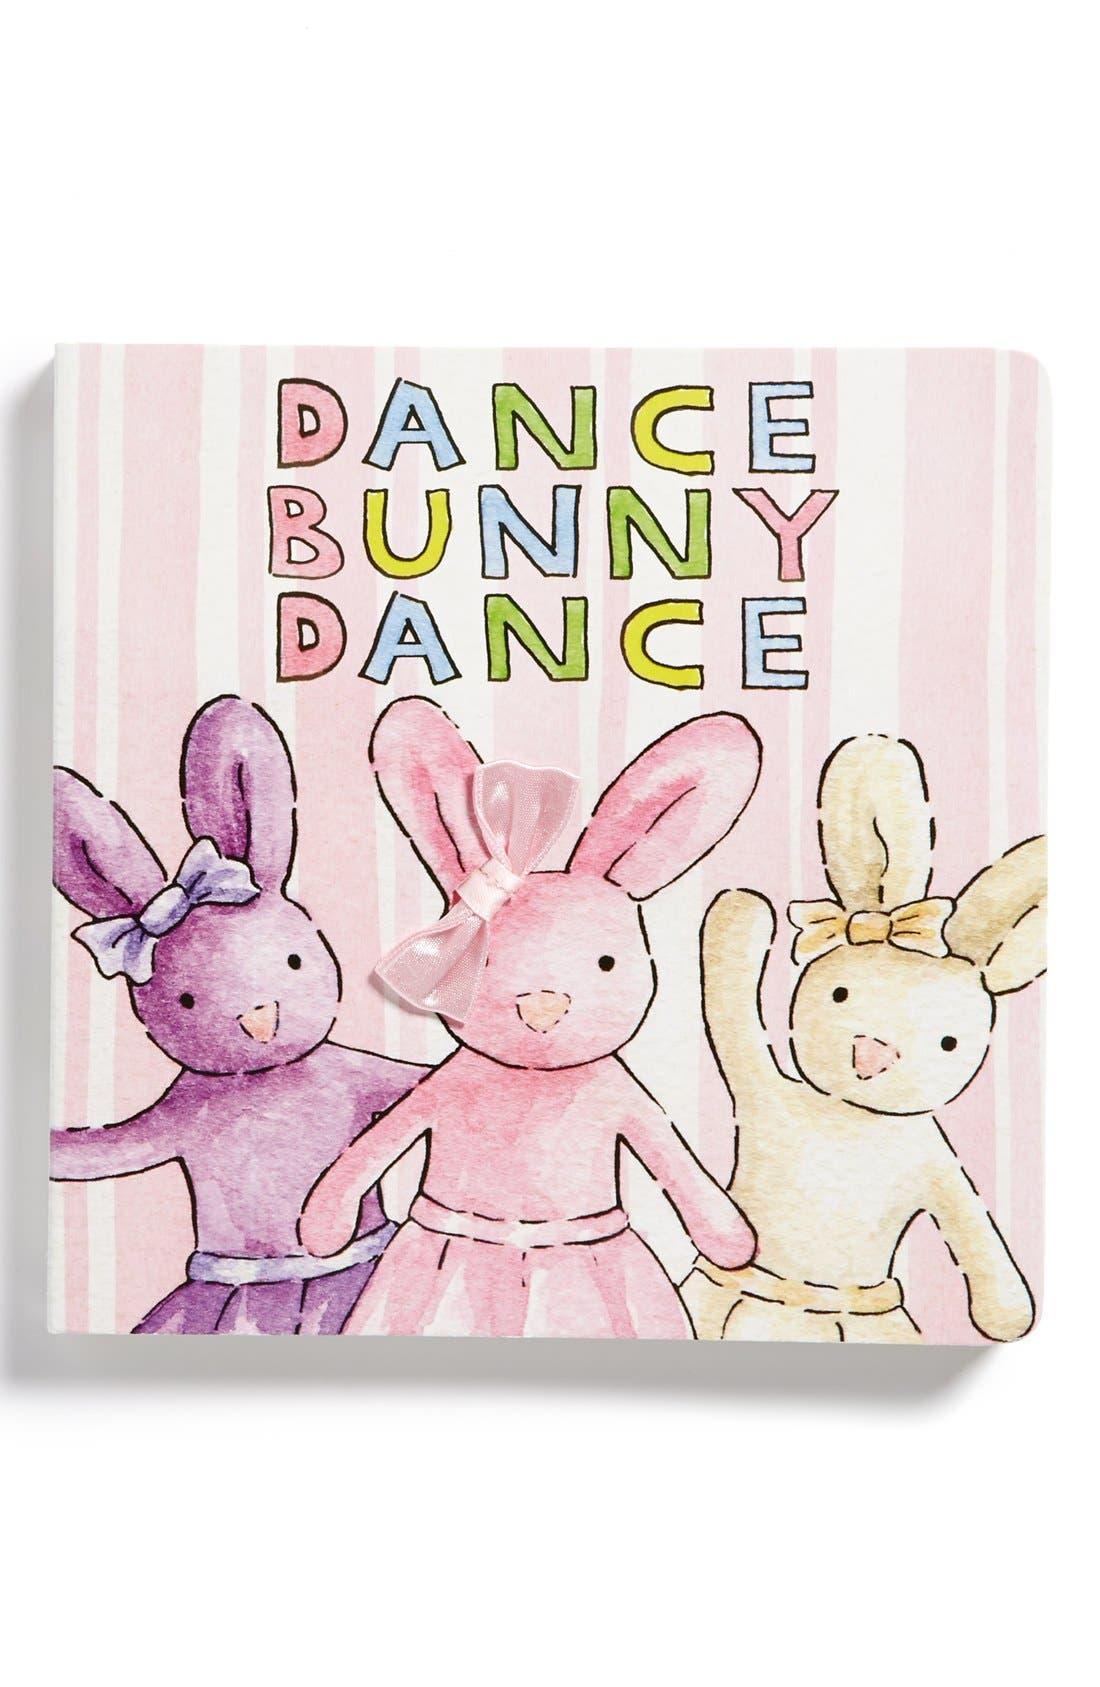 'Dance Bunny Dance' Book,                             Main thumbnail 1, color,                             CREAM